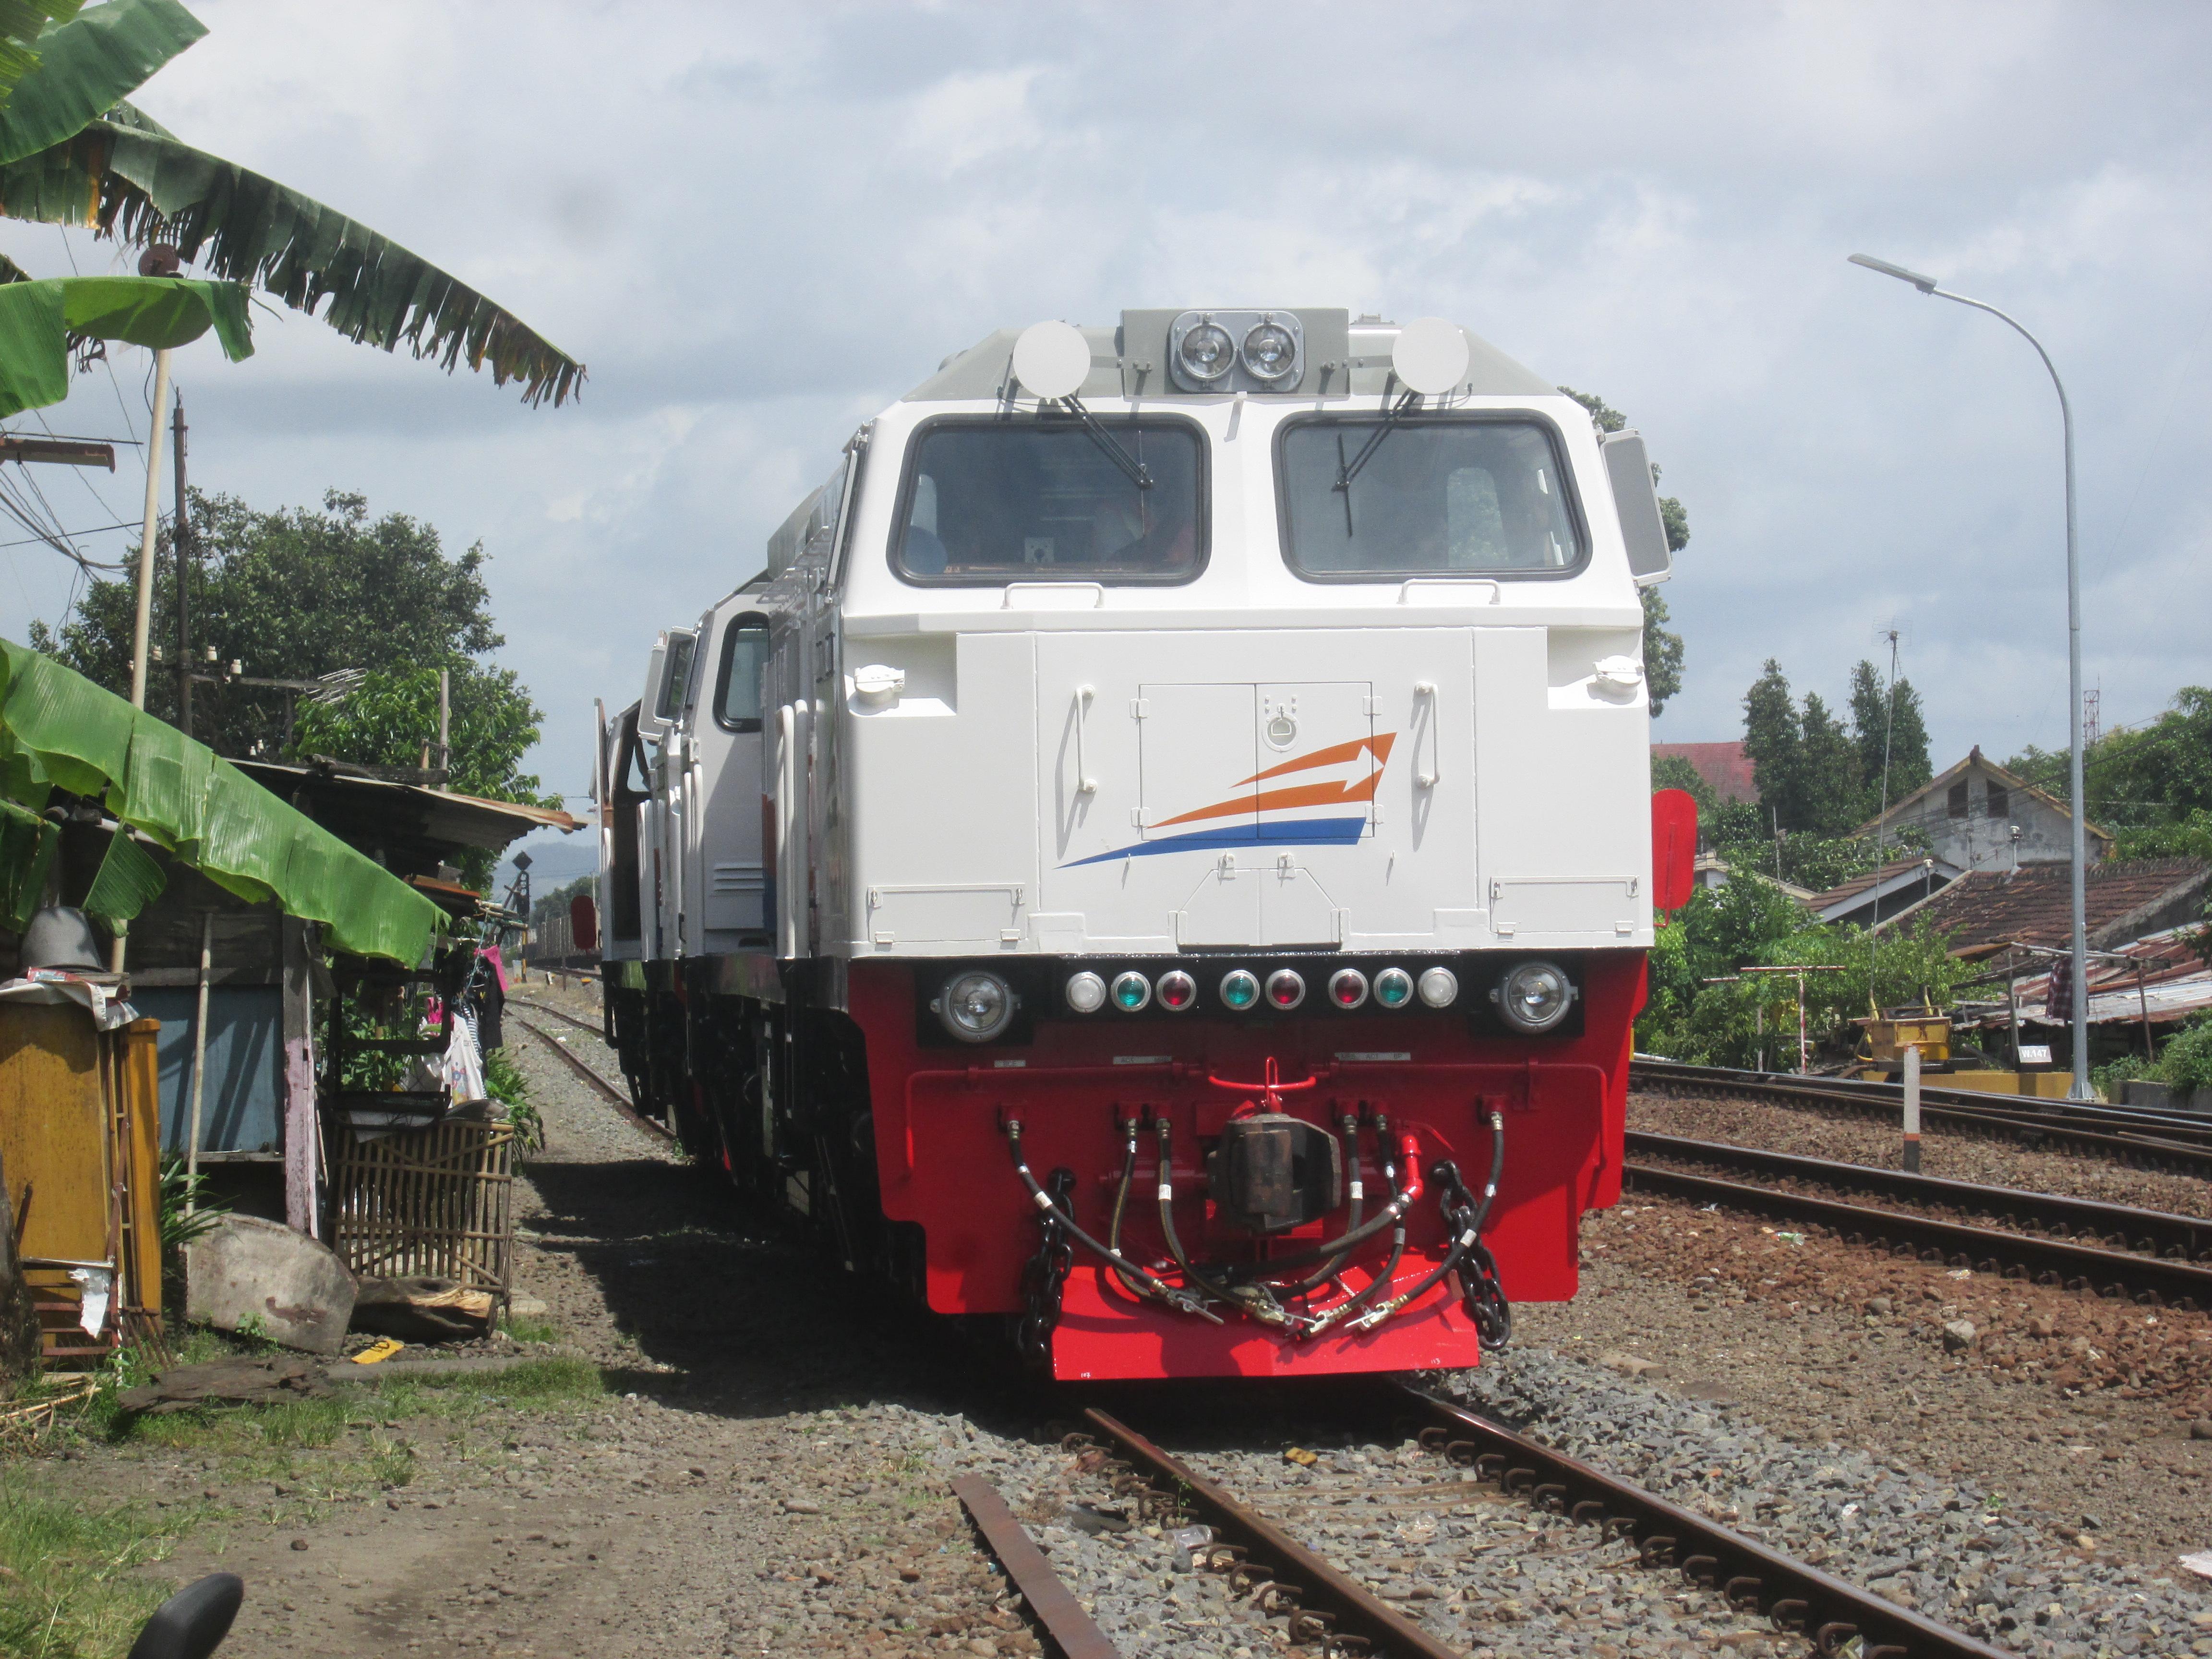 Lokomotif CC206 Bahasa Indonesia Ensiklopedia Bebas